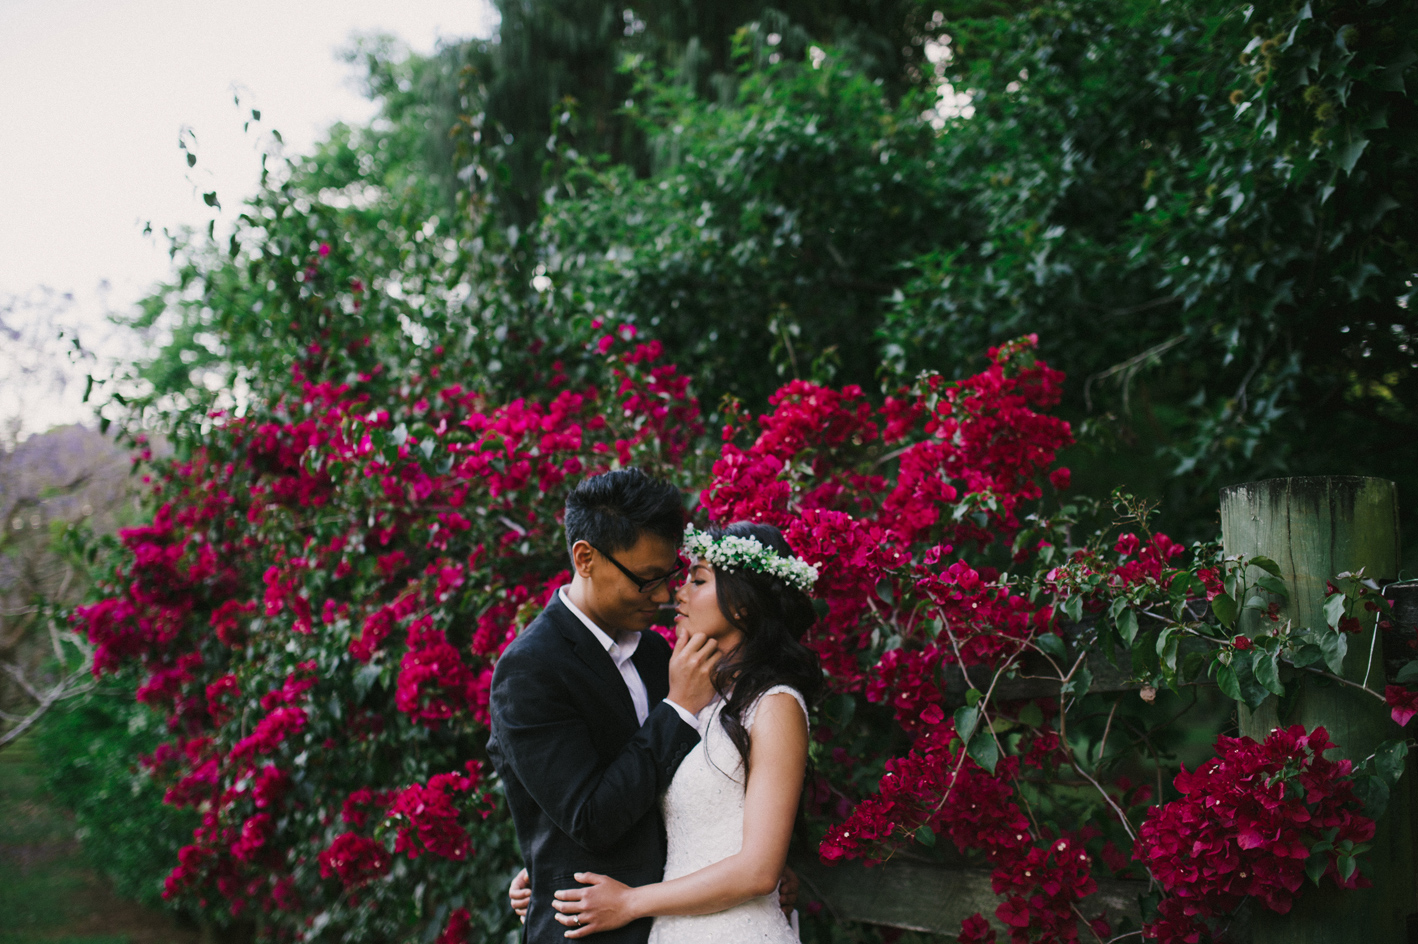 021-ed-janet-currumbin-wedding_sophie-baker-photography